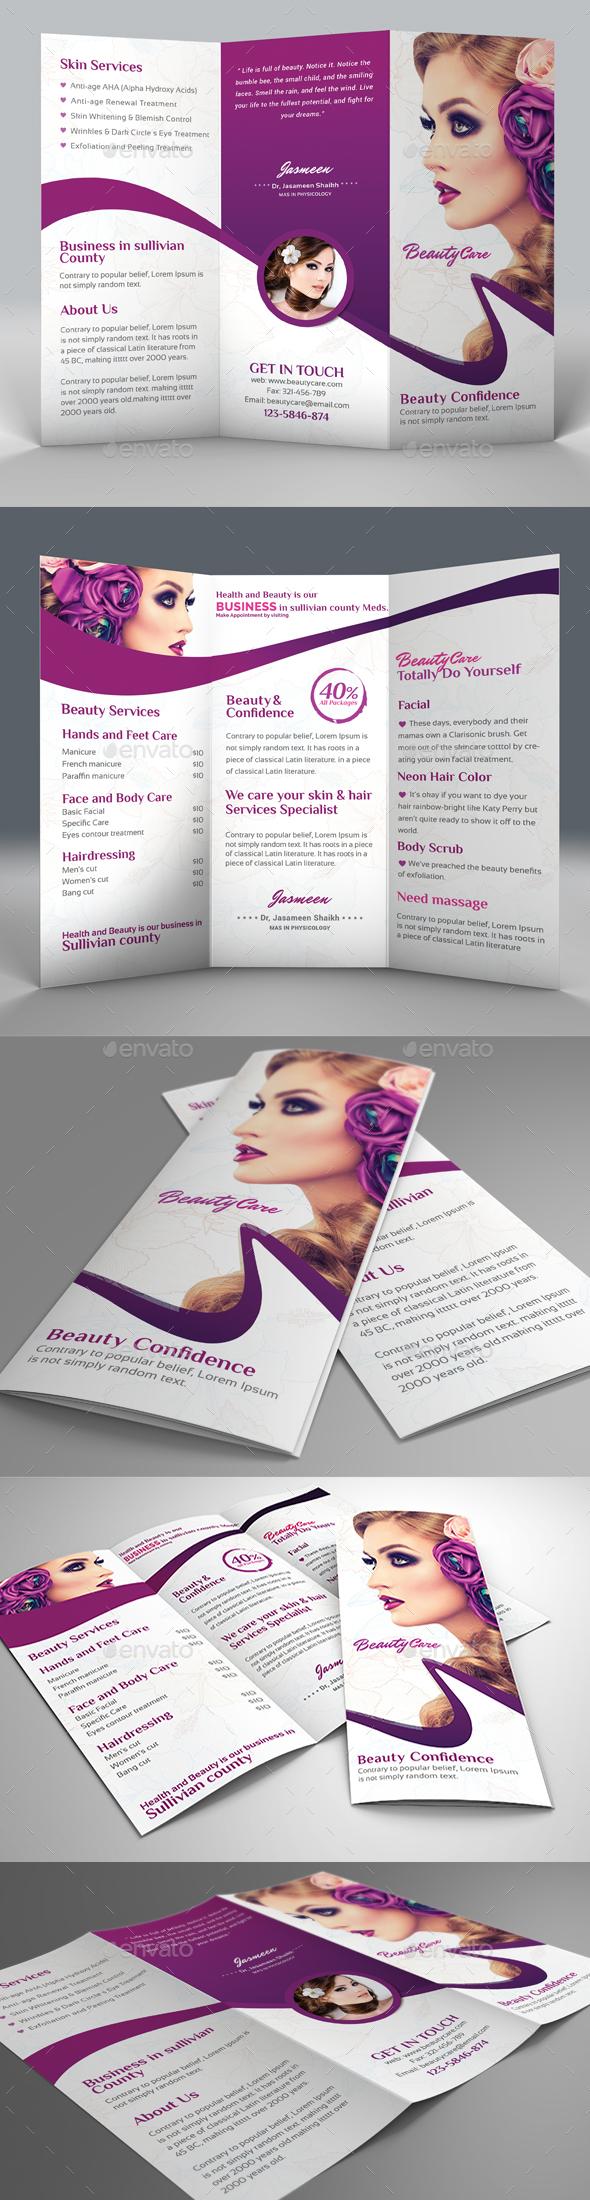 Beauty Salon Trifold Brochure - Corporate Brochures